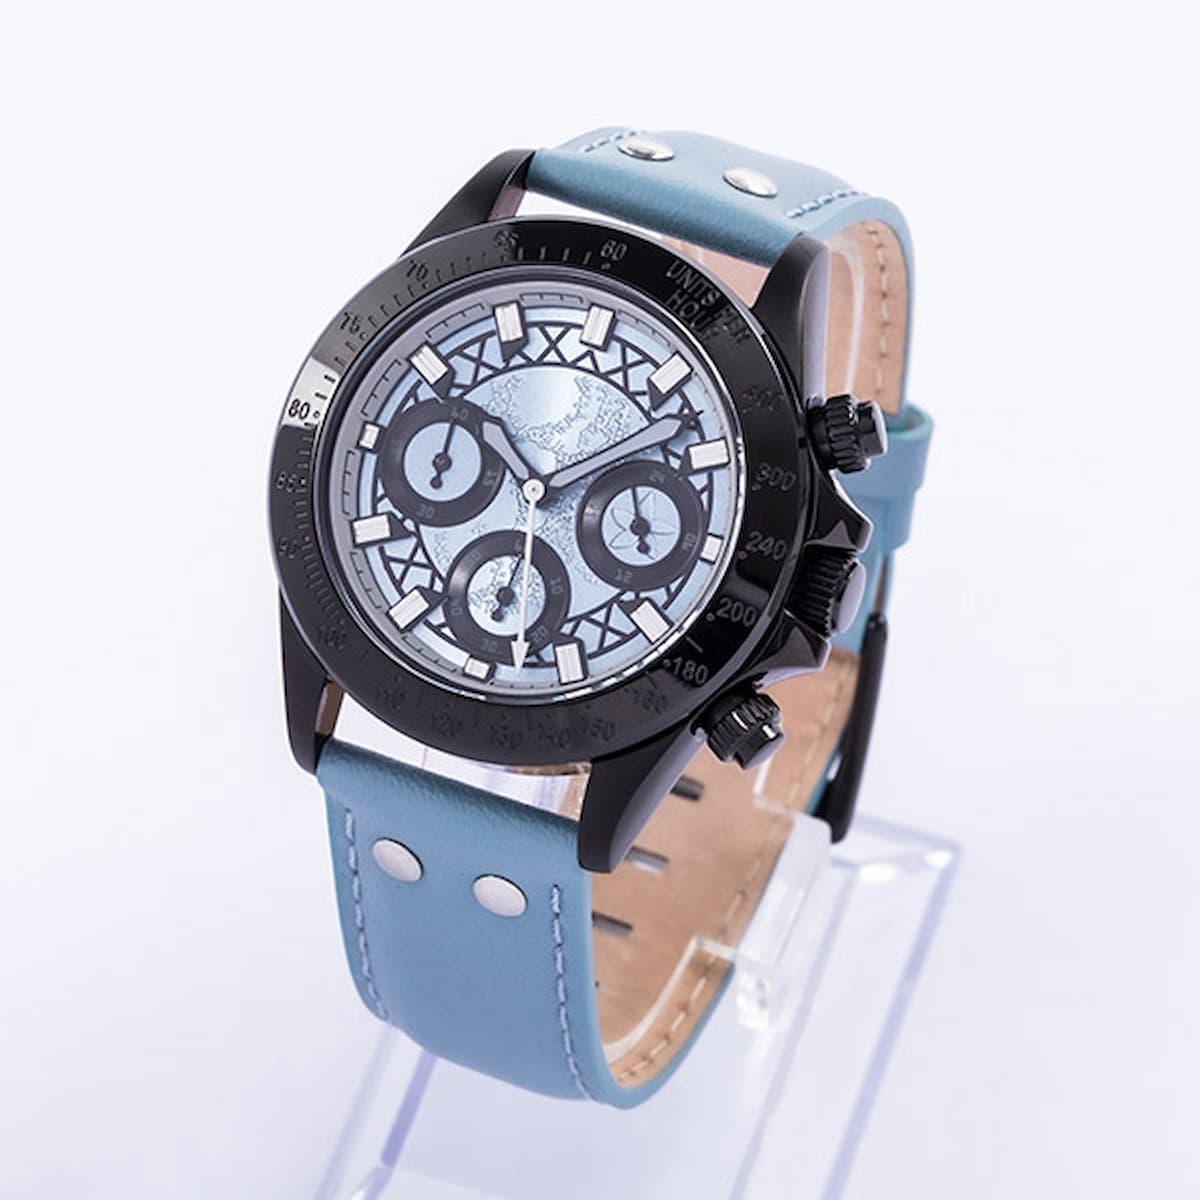 「NieR Replicant」腕時計<カイネモデル>